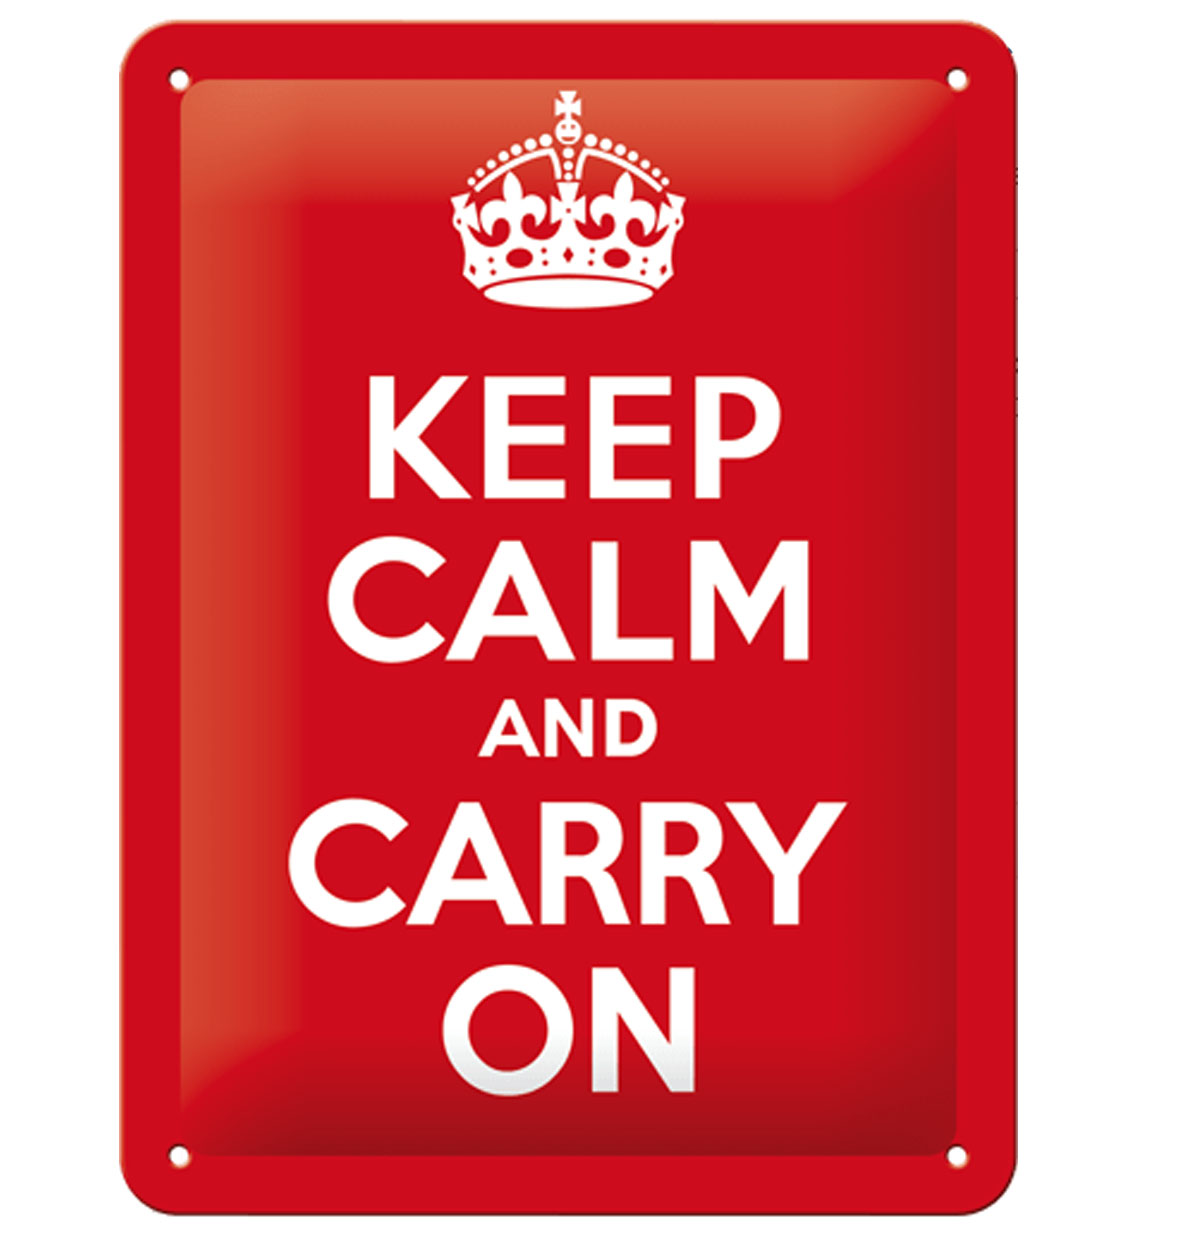 Tin Sign 'Keep Calm and Carry On' 15 x 20 cm